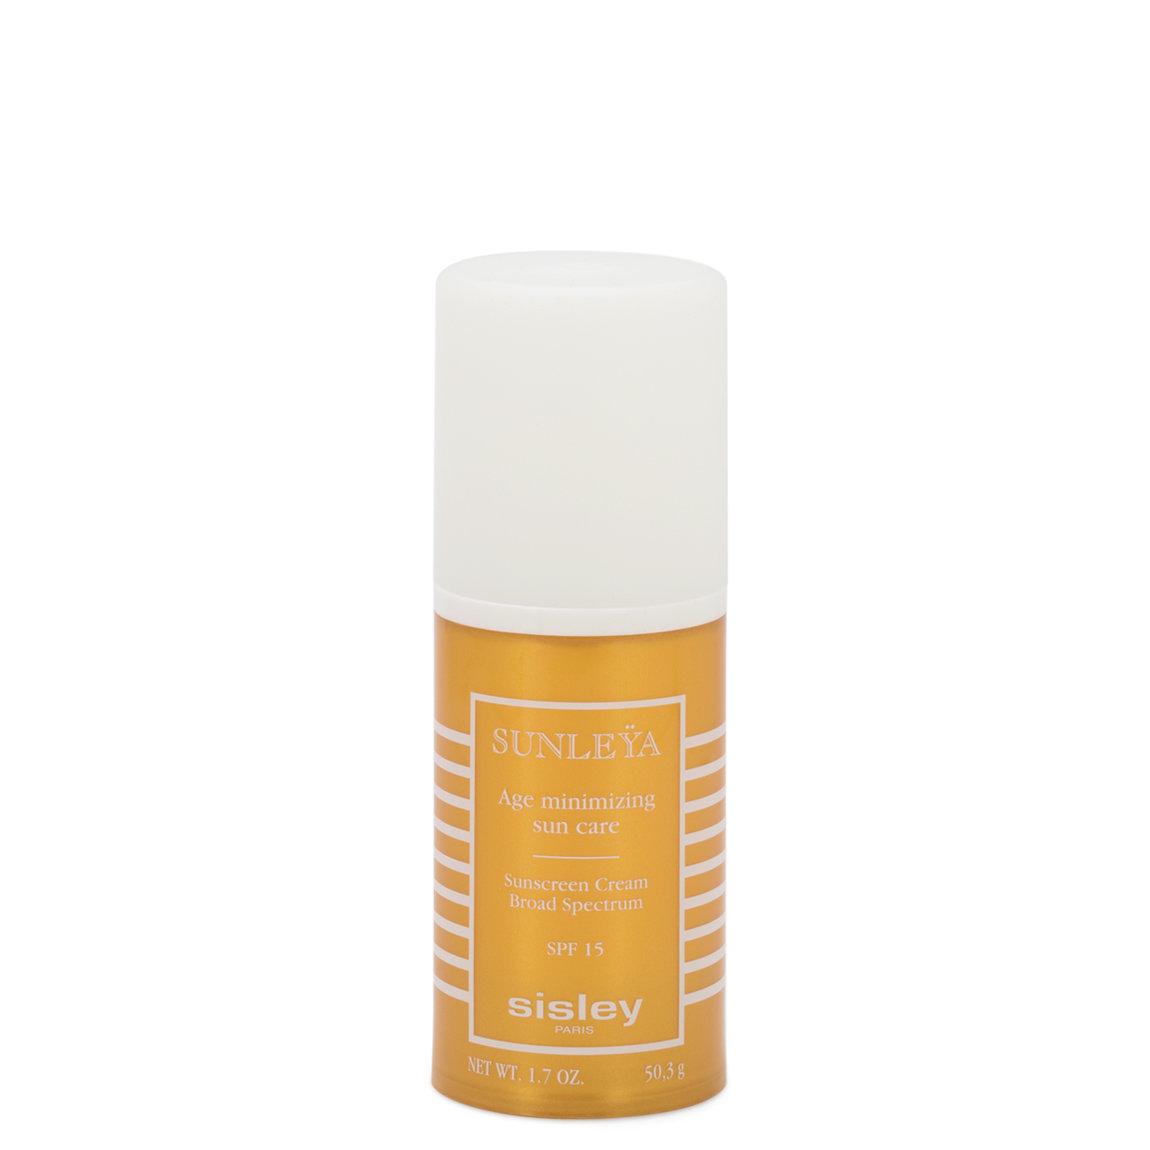 Sisley-Paris Sunleÿa Age Minimizing Sun Care SPF 15 alternative view 1 - product swatch.